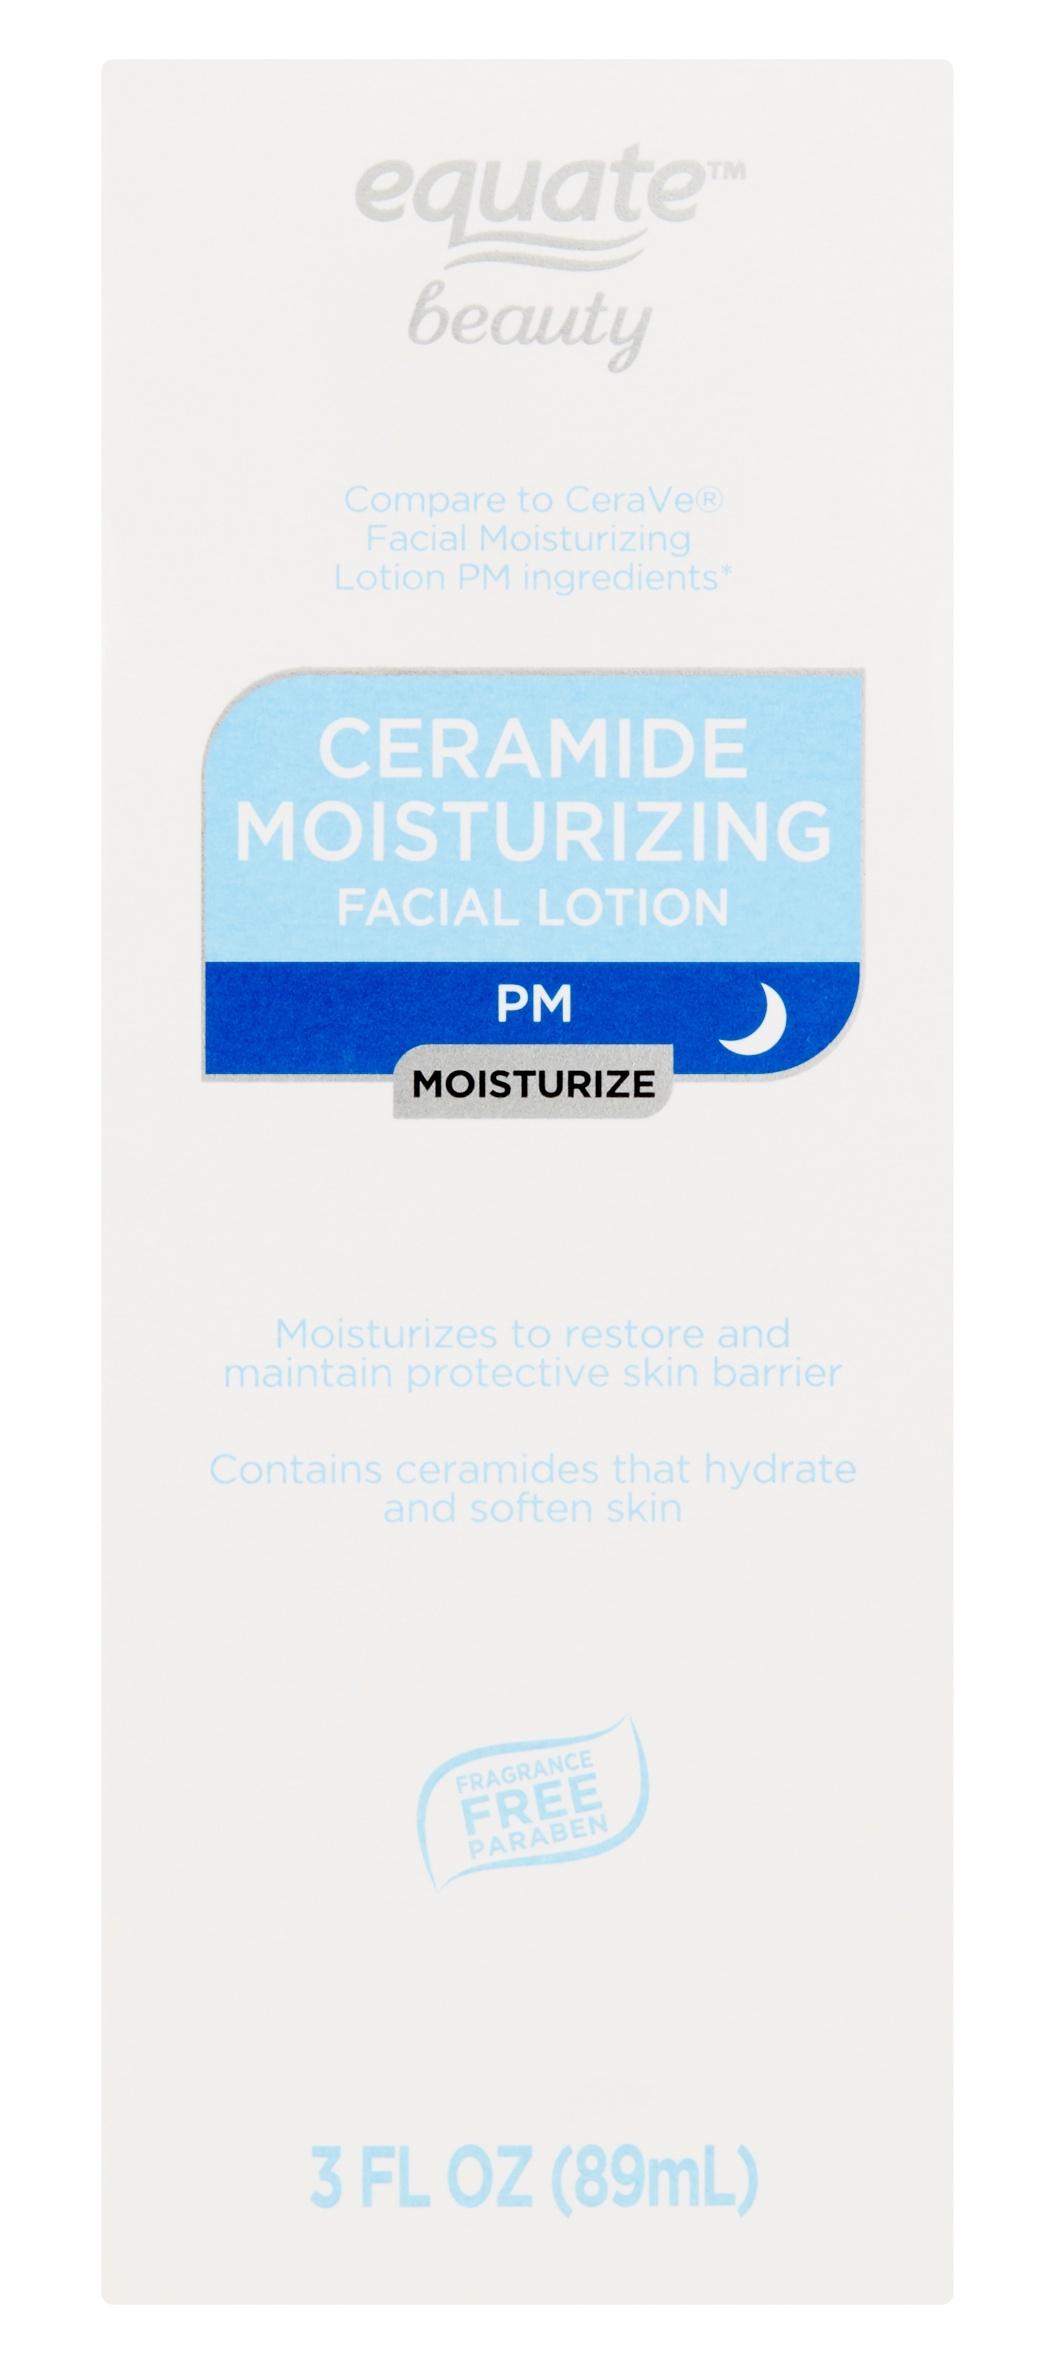 Equate Beauty Ceramide Moisturizing Facial Lotion PM